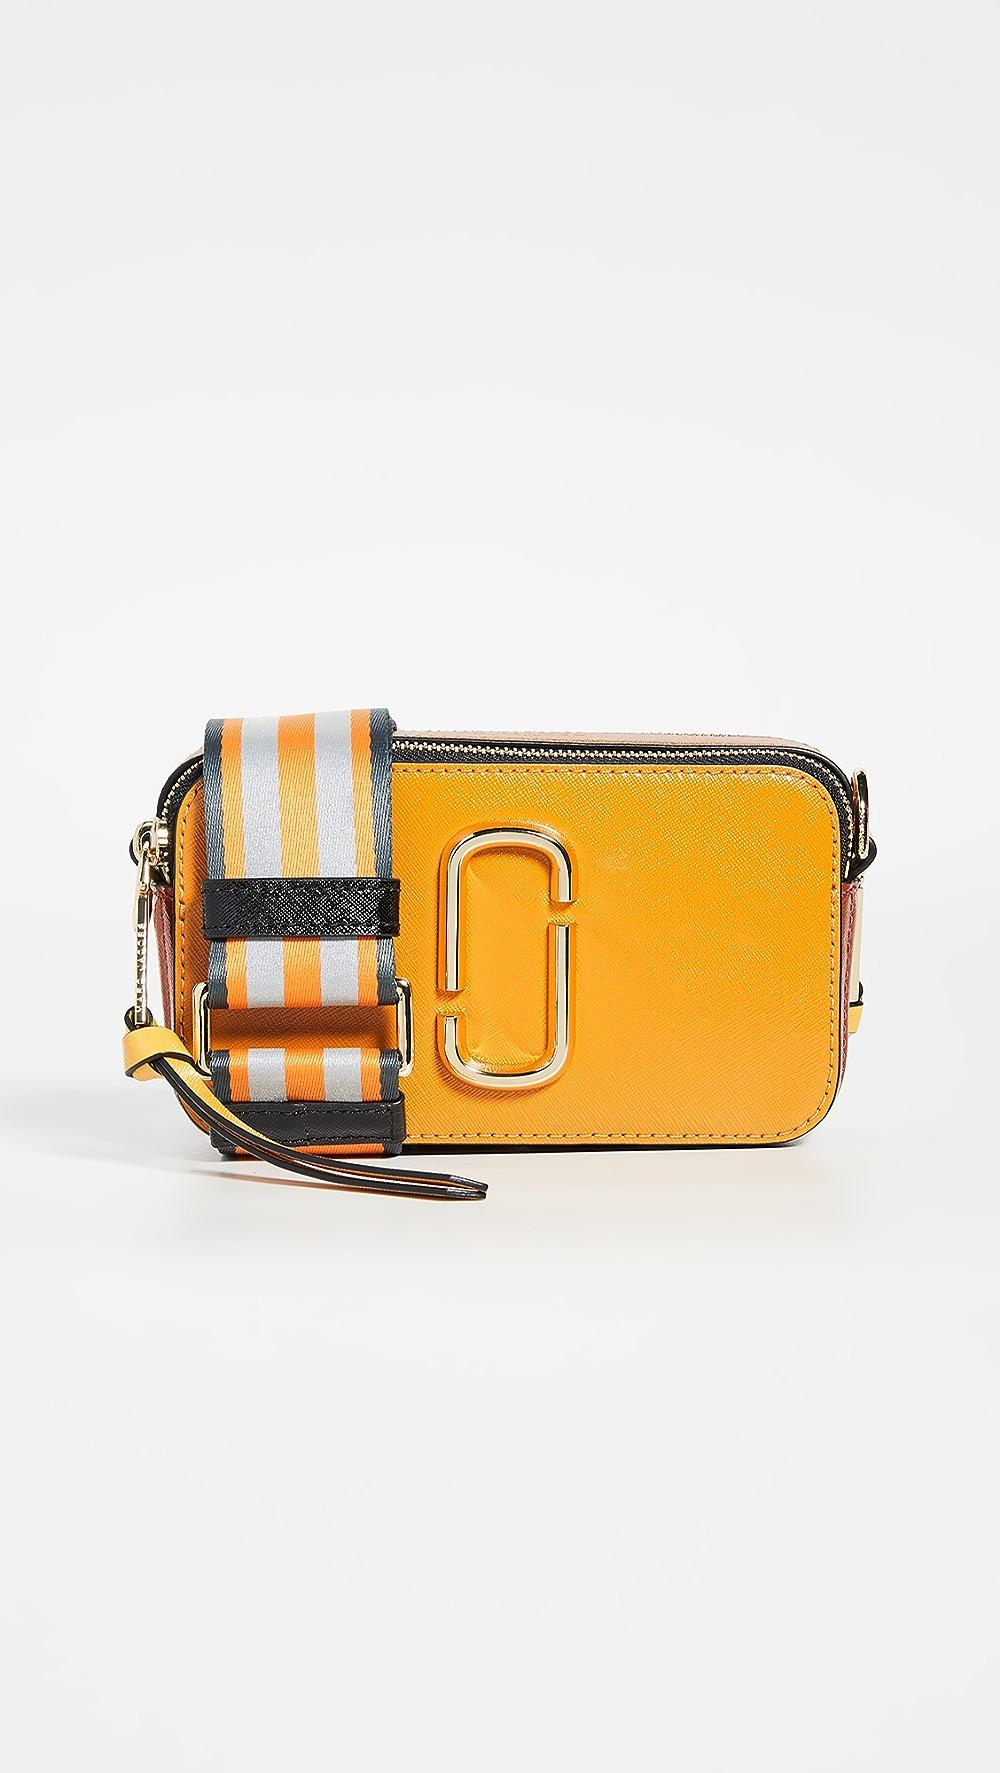 100% True The Marc Jacobs - Snapshot Camera Bag Clear-Cut Texture